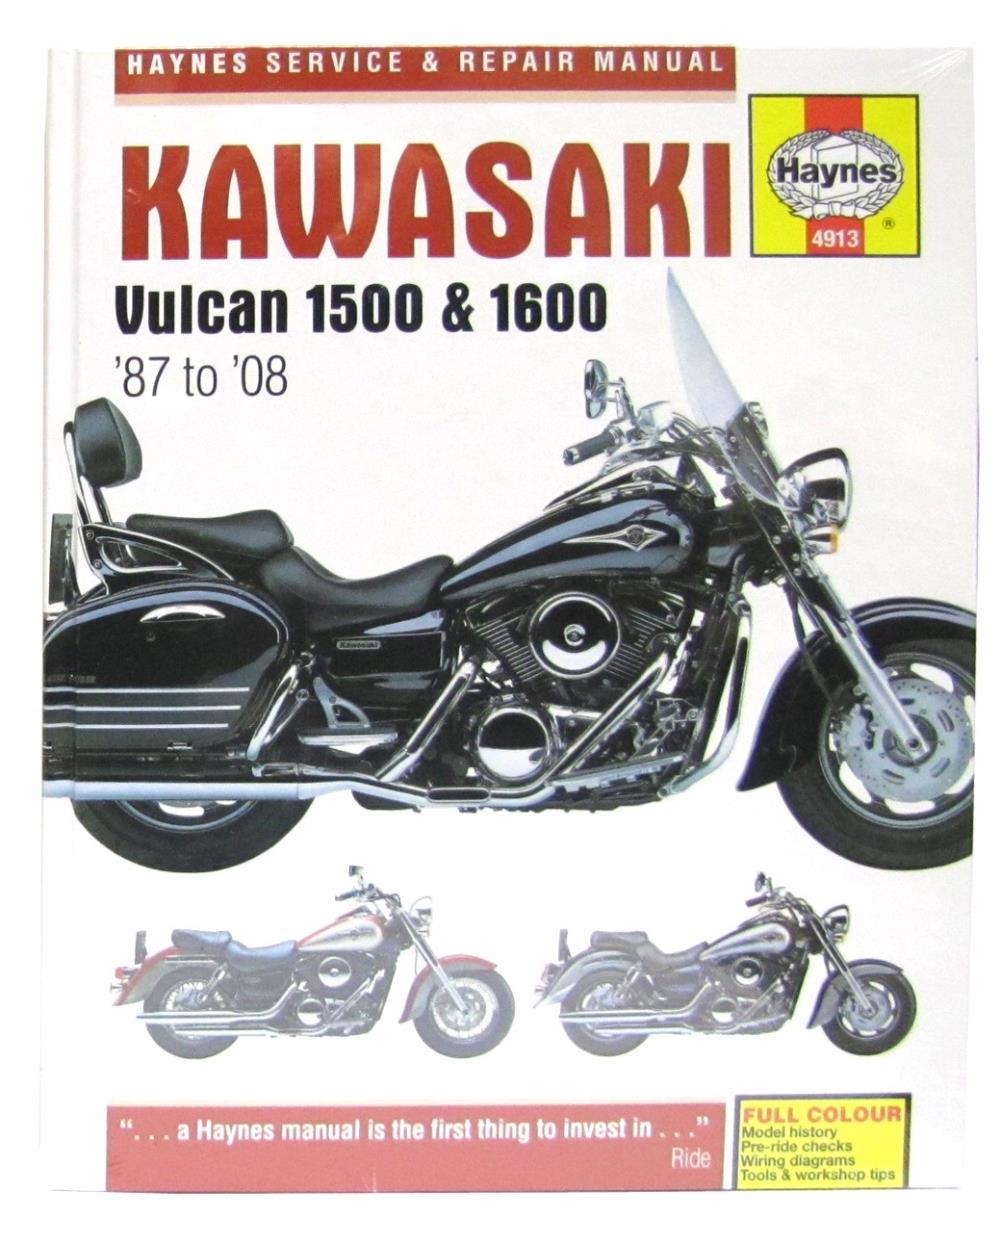 manual haynes for 2007 kawasaki vn 1600 a6f classic ebay. Black Bedroom Furniture Sets. Home Design Ideas